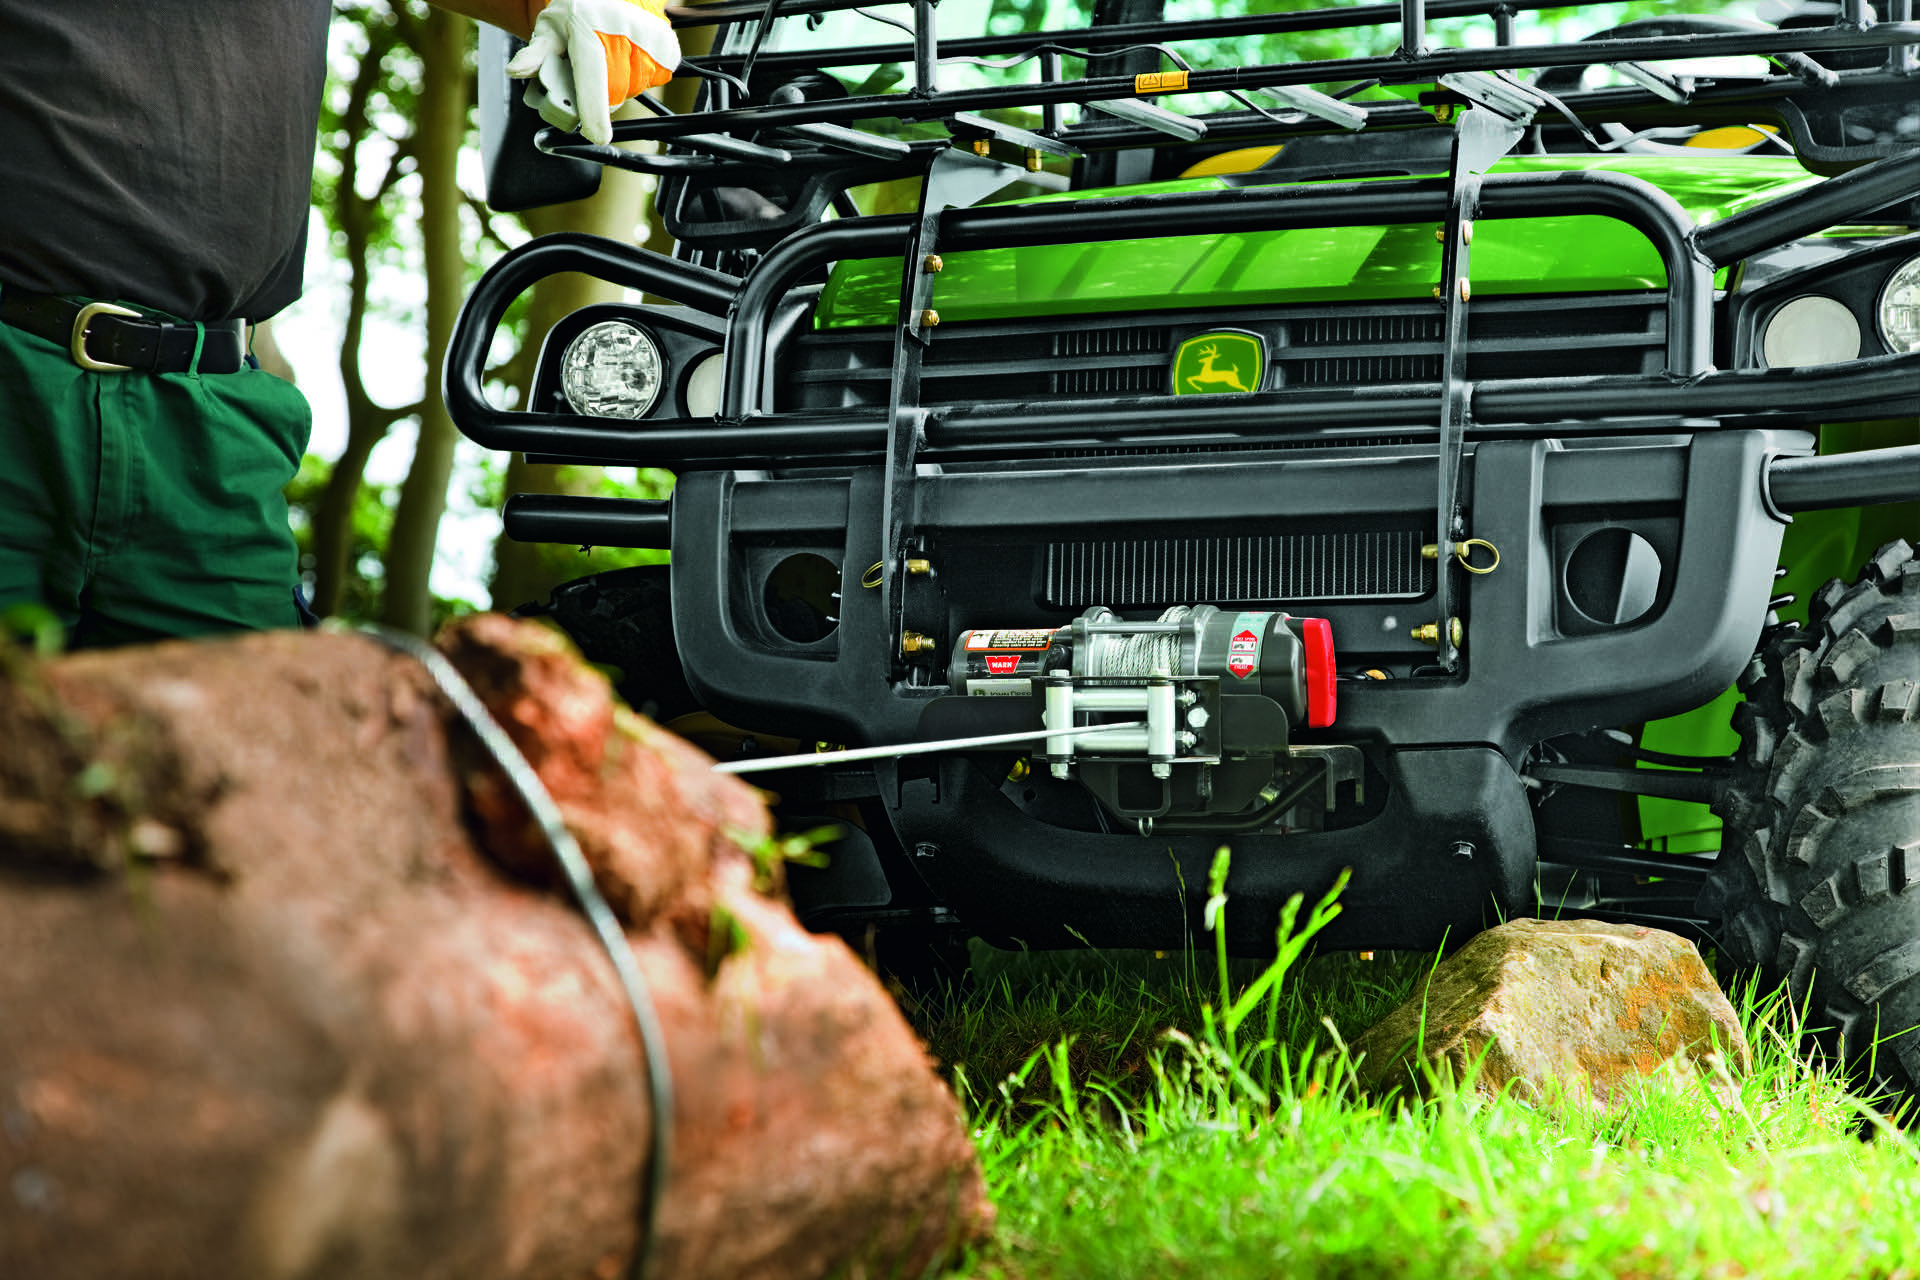 John Deere Gator Revierfahrzeug XUV Revier 4x4 Transport